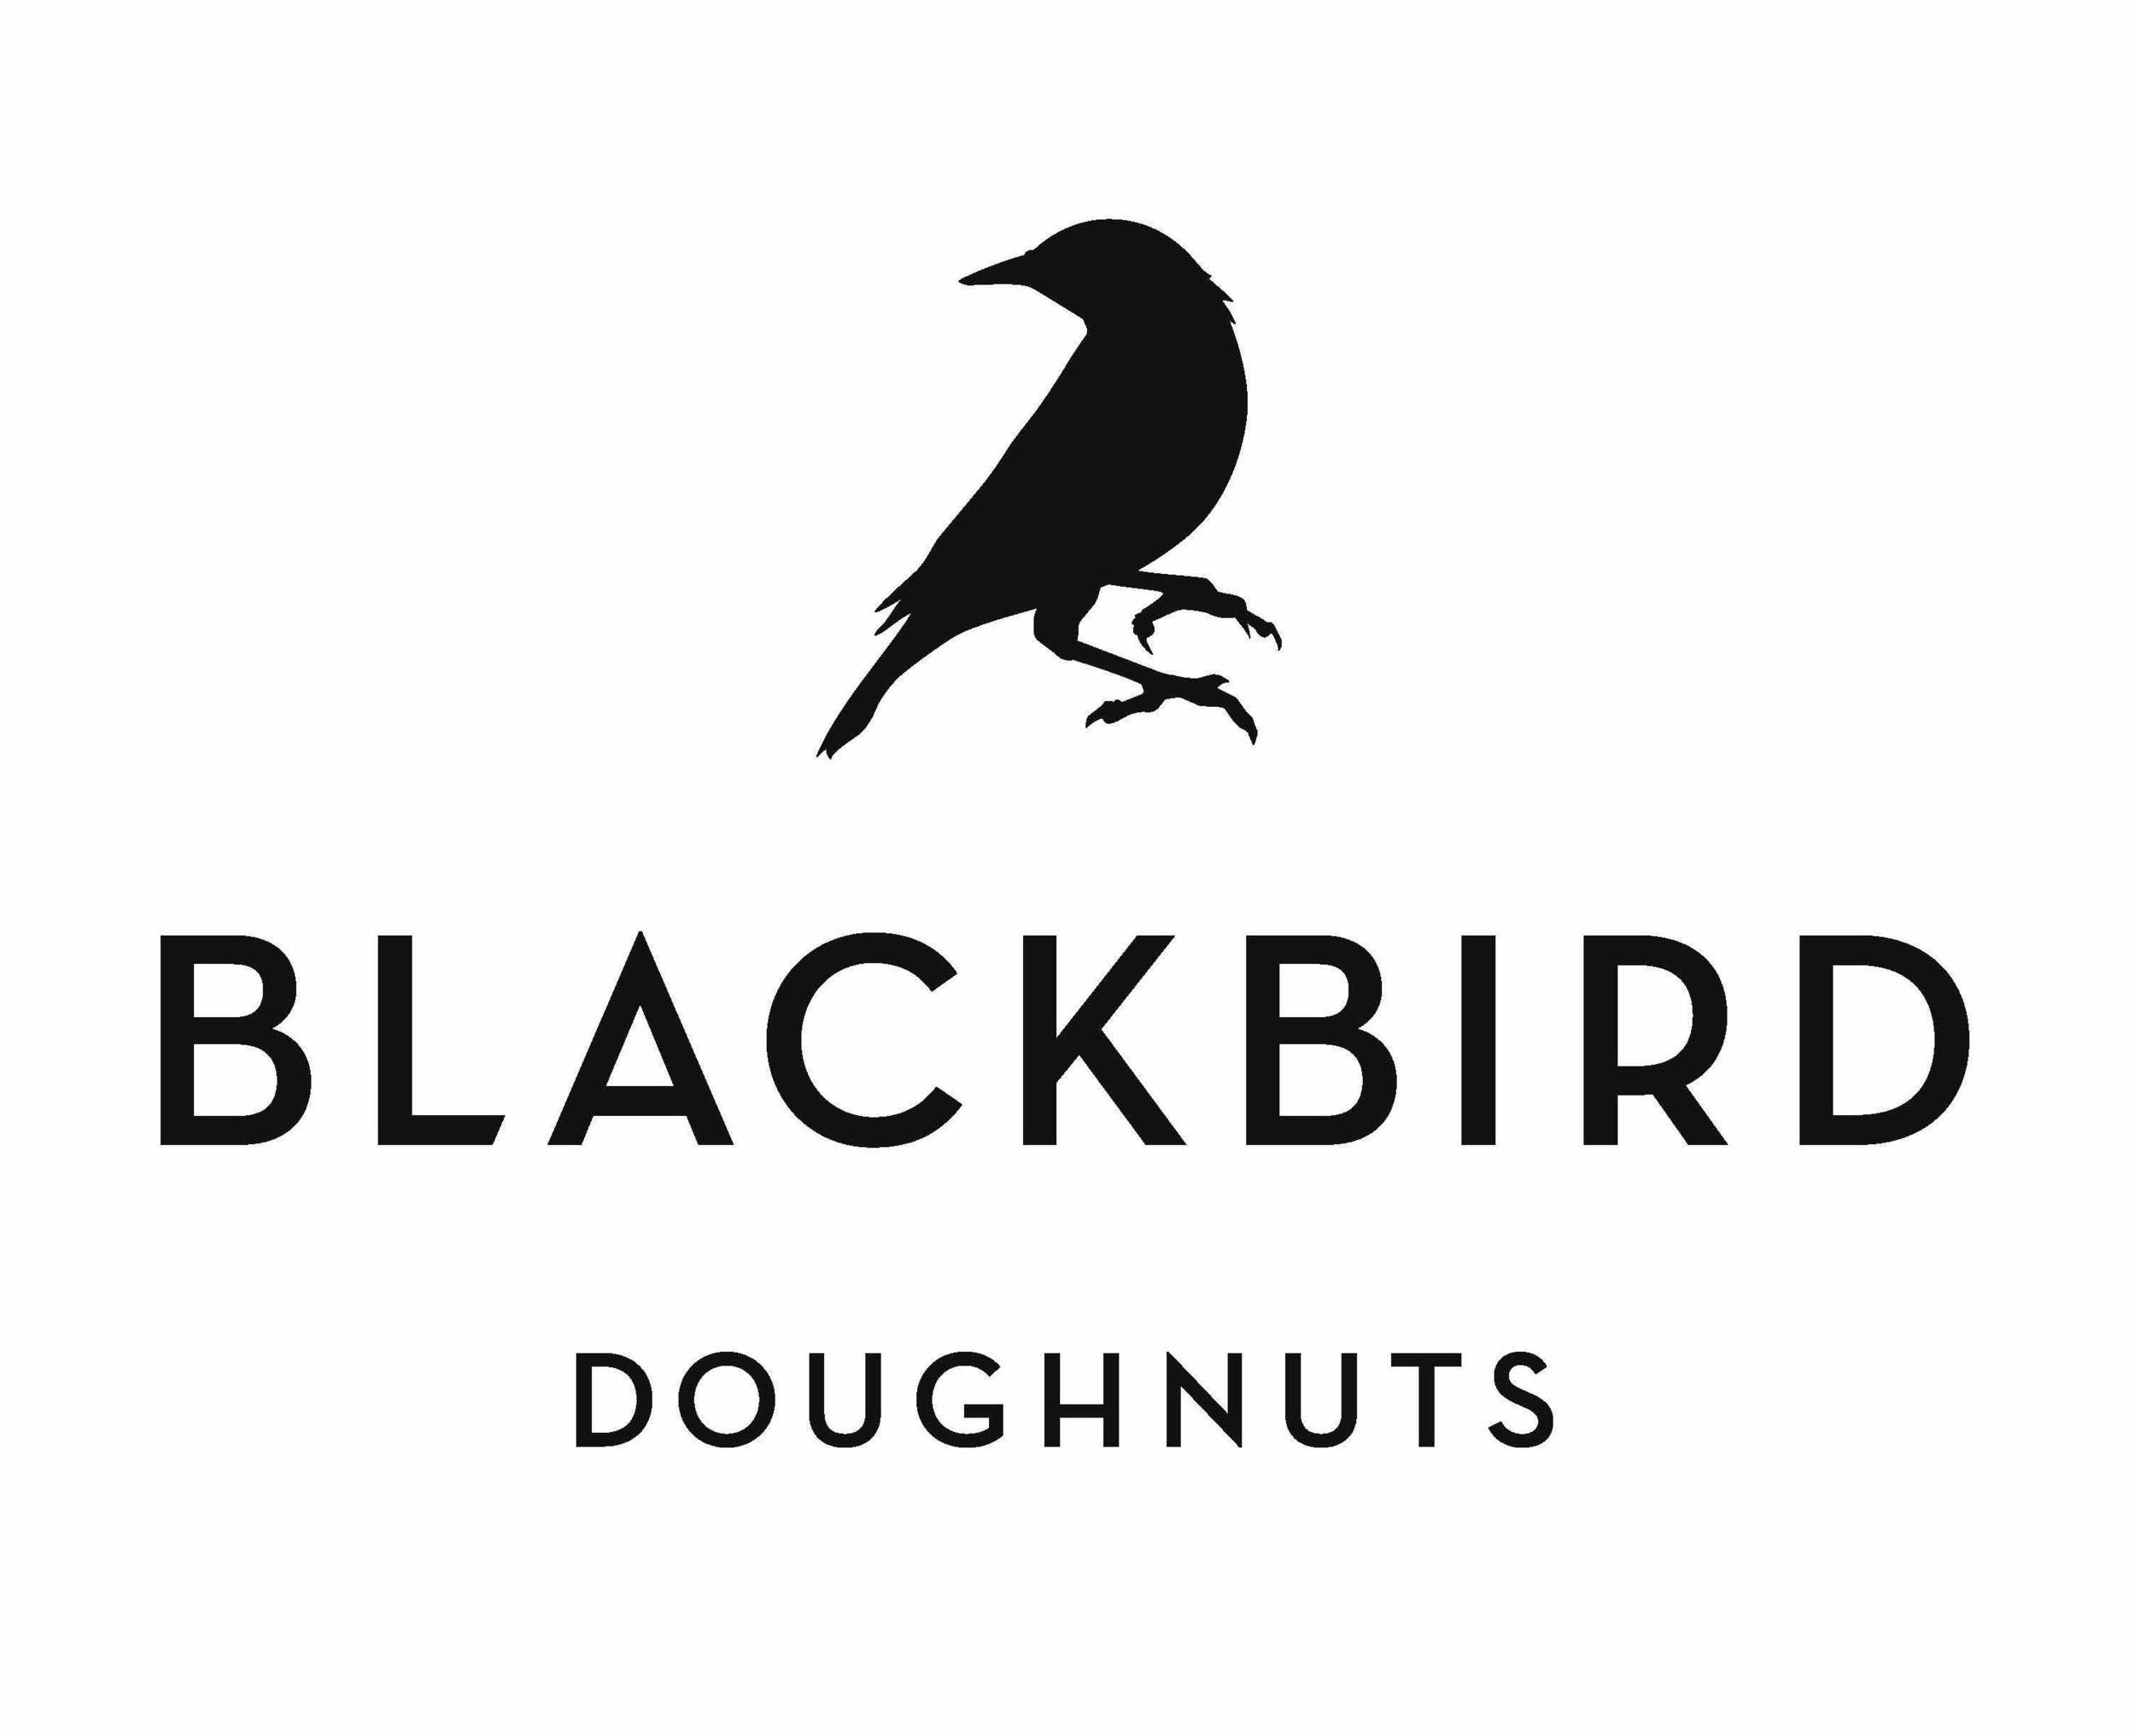 BLACKBIRD LOGO BW_Page_1.jpg